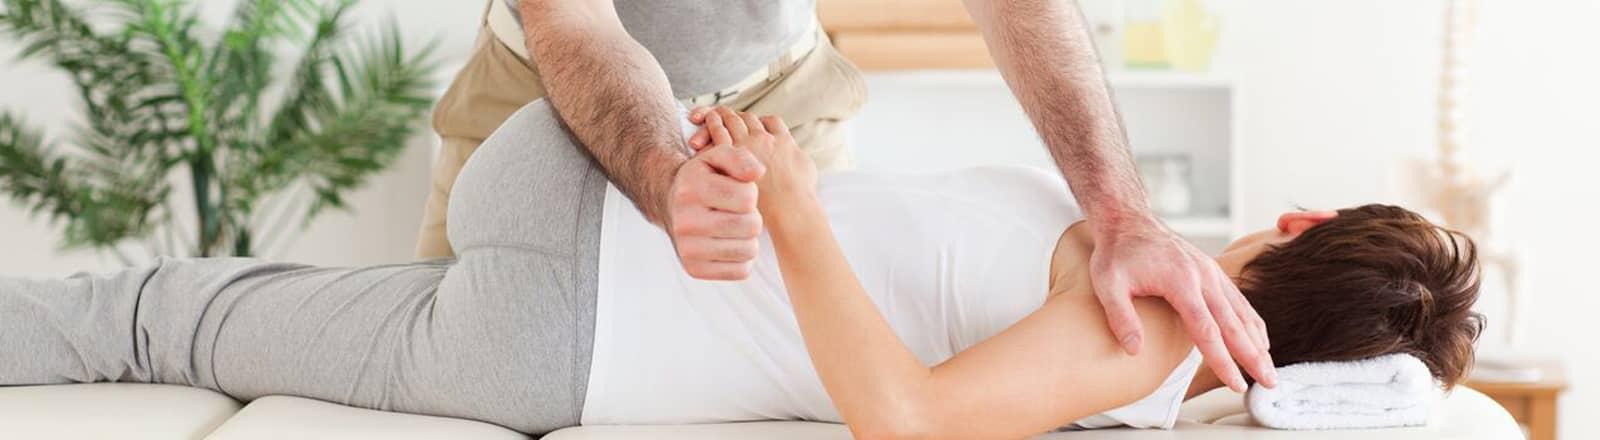 osteopatia visceral Palma